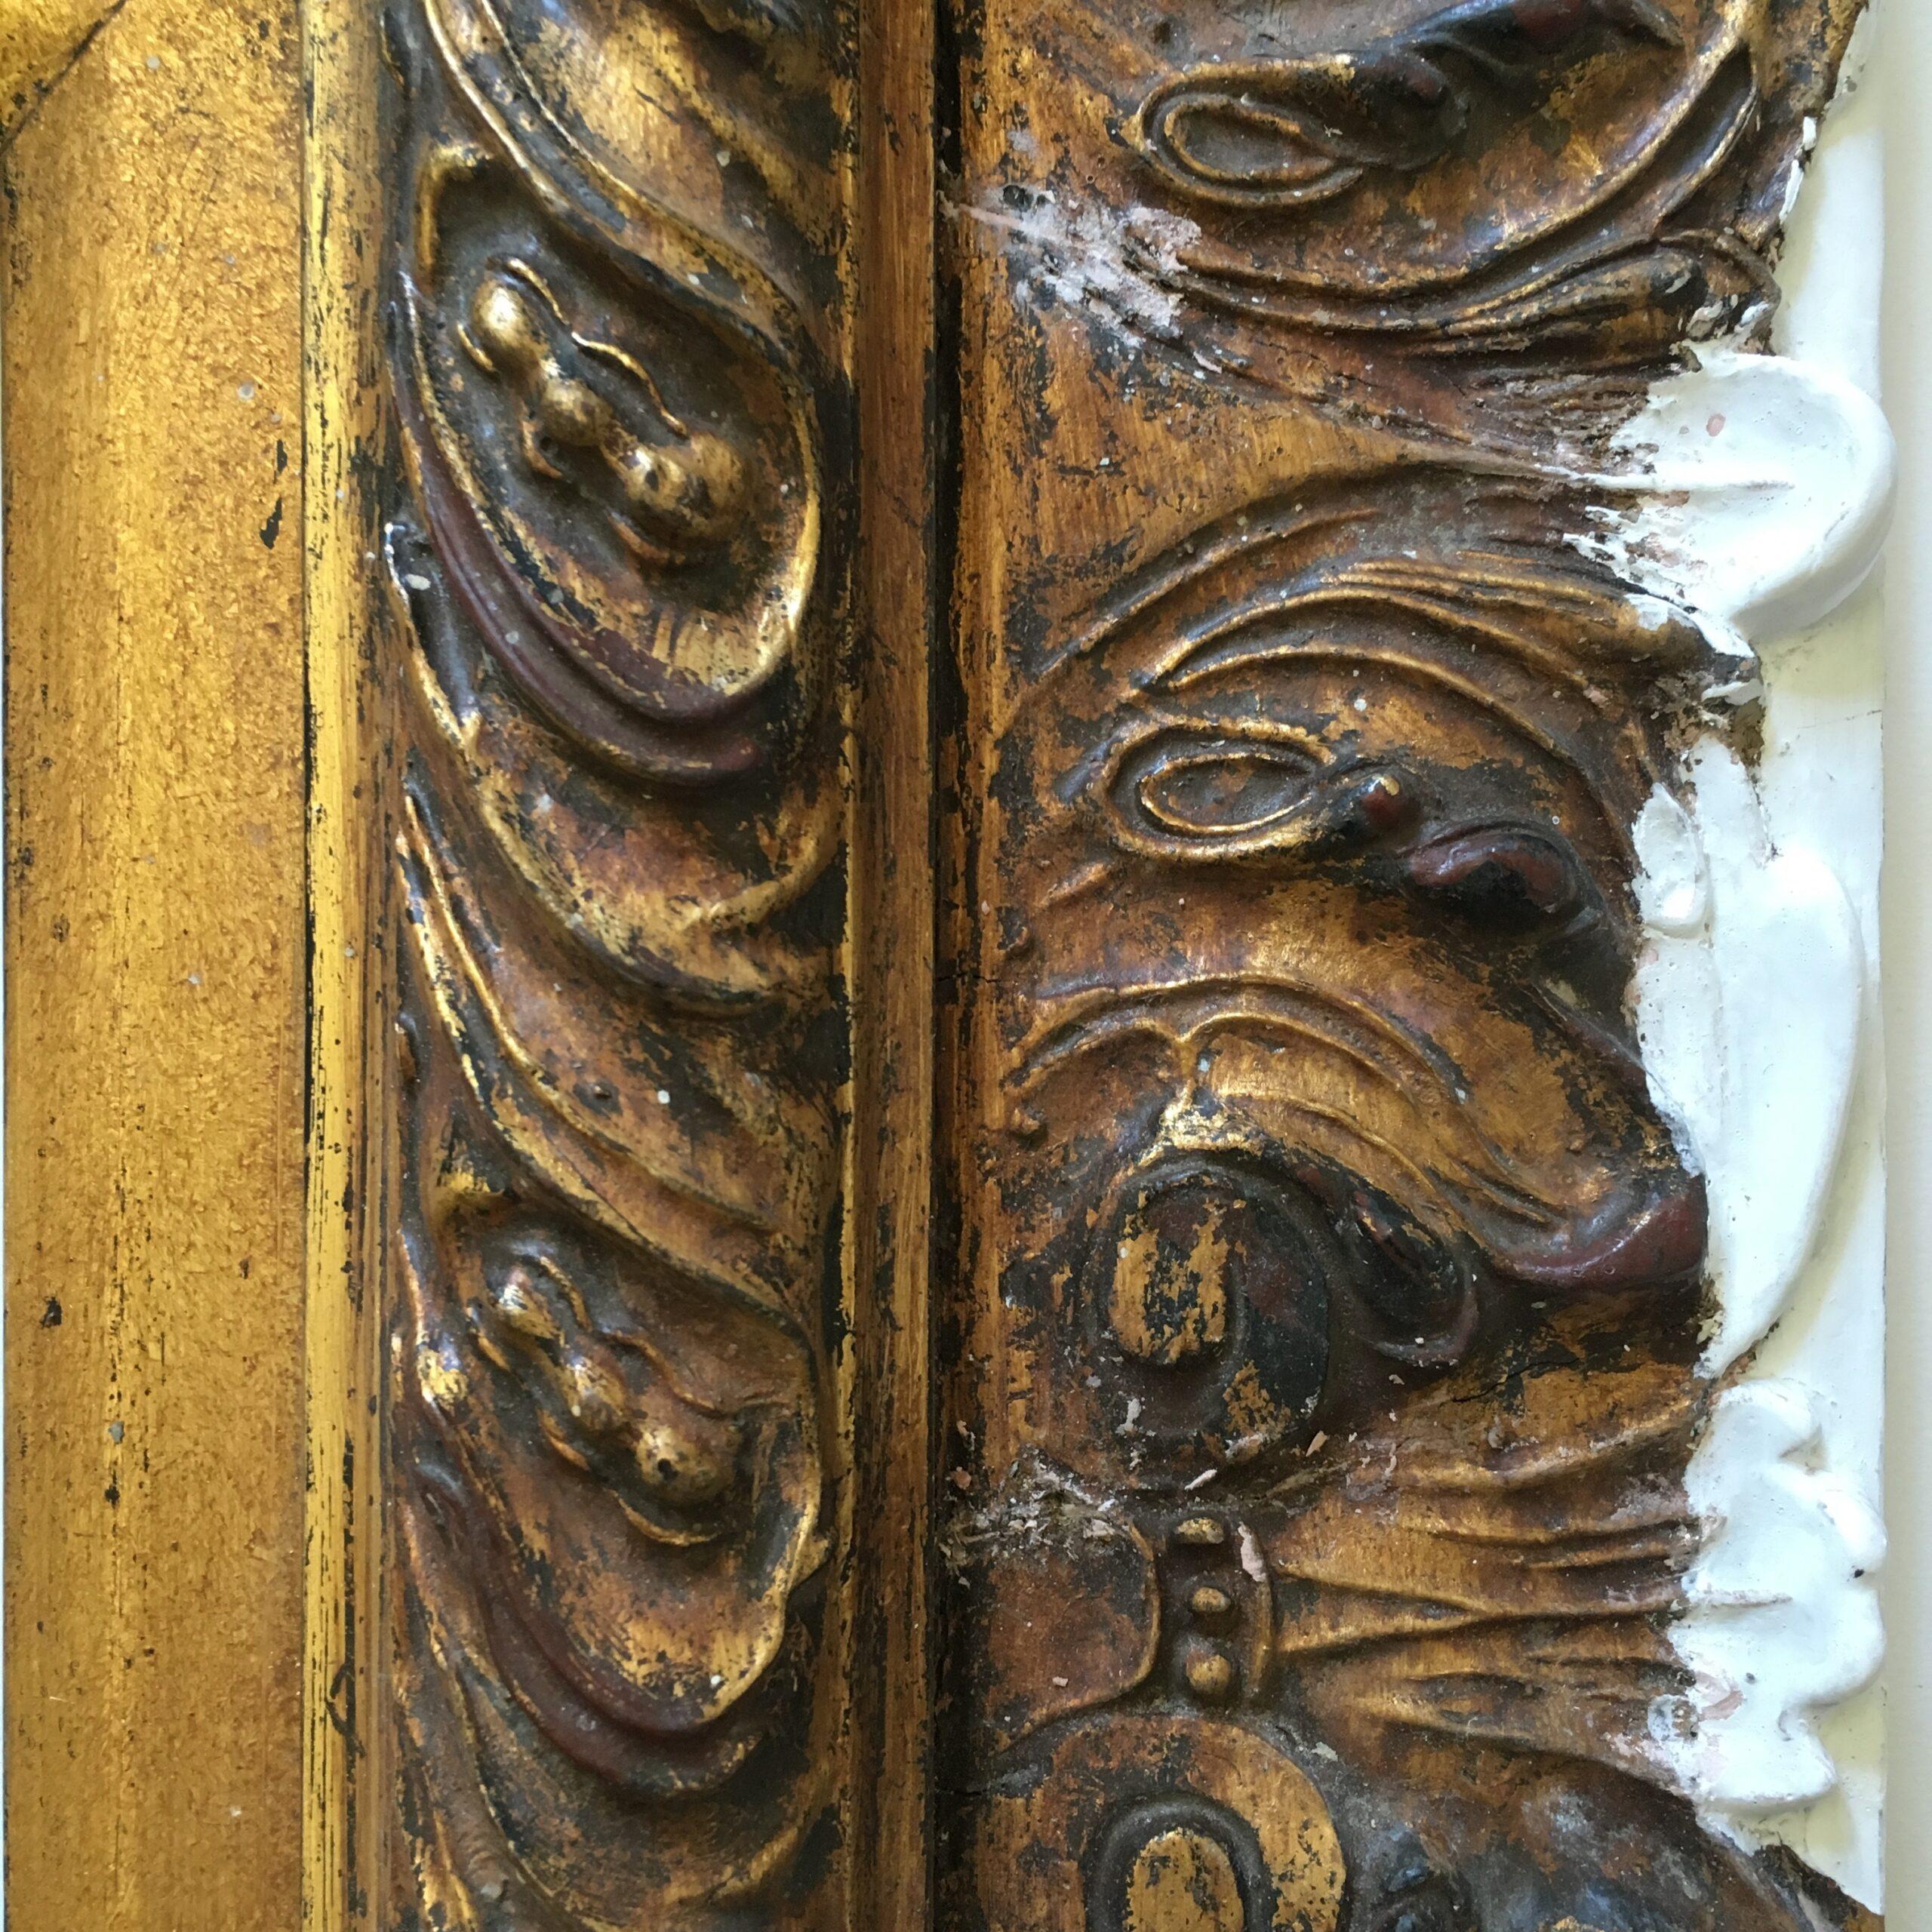 85ca0a36a219 Restoration - Rich and Davis Artisan Frame Makers